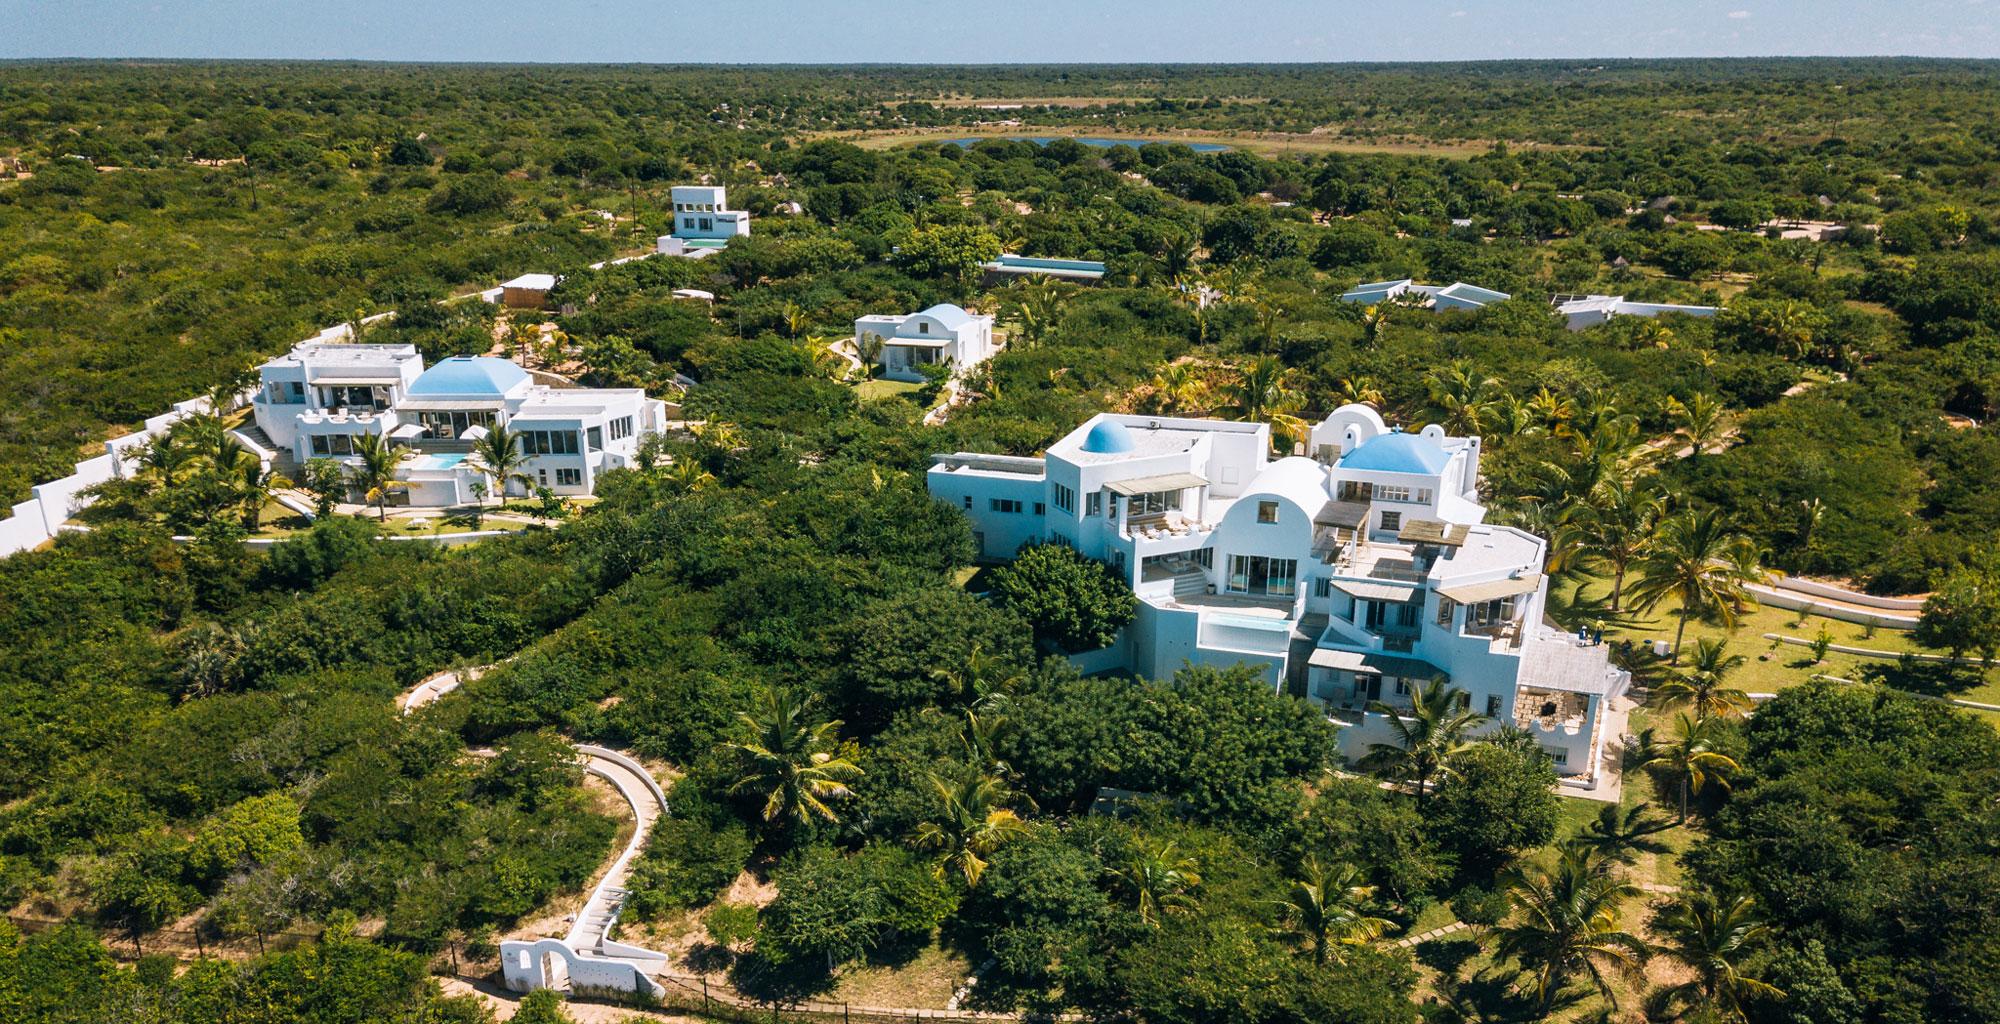 Mozambique-Bazaruto-Archipelago-Santorini-Exterior